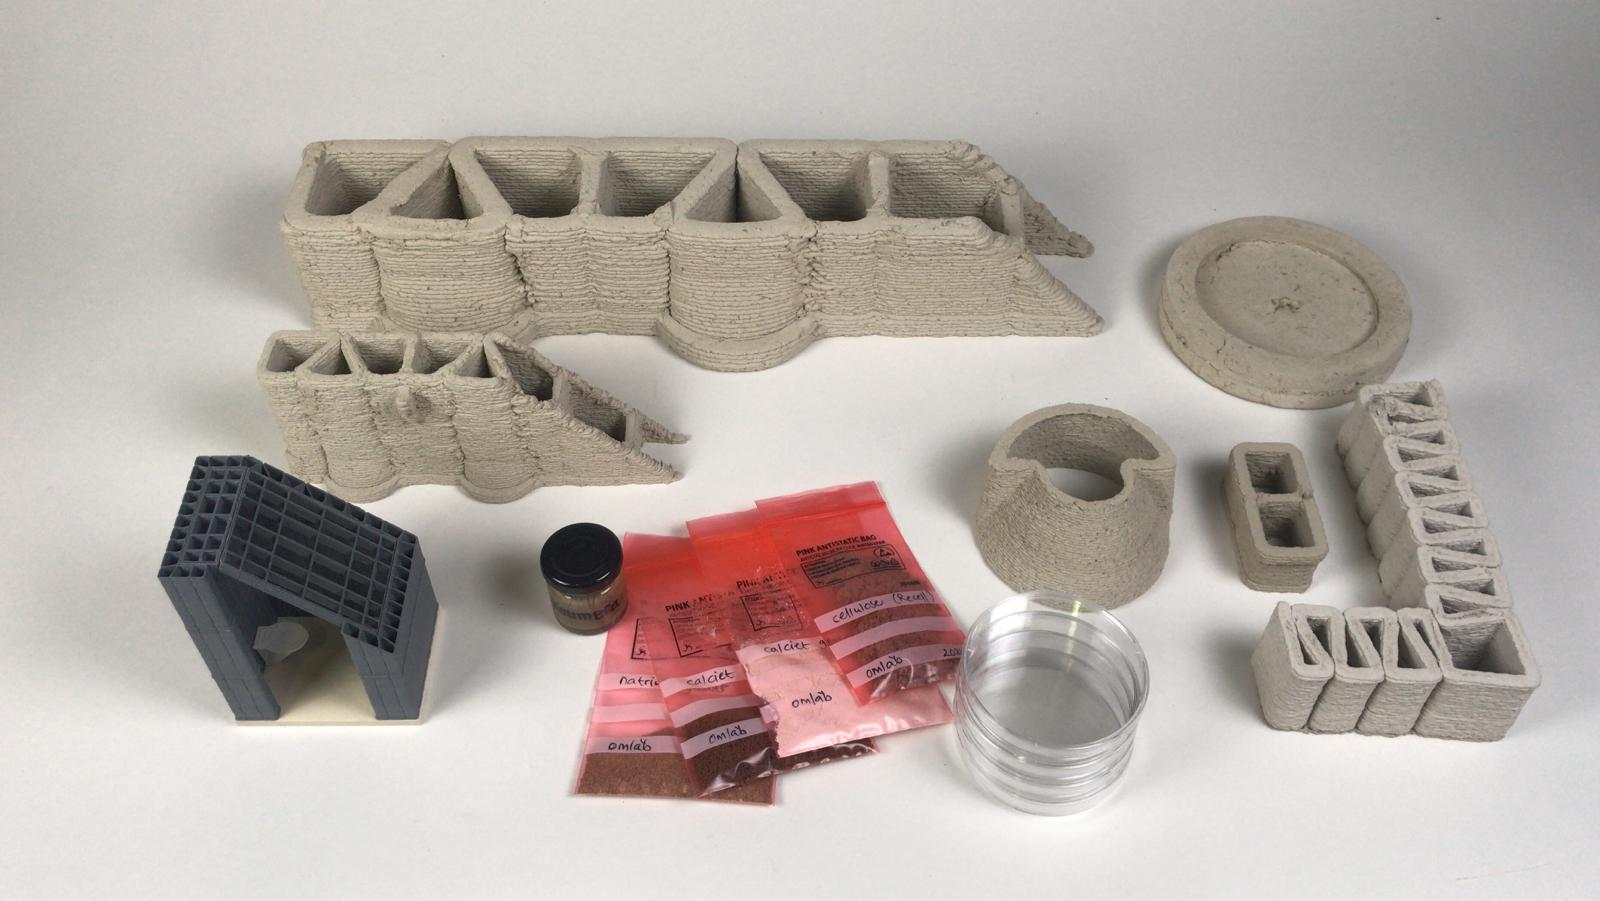 veel objecten, 3dprints en grondstoffen